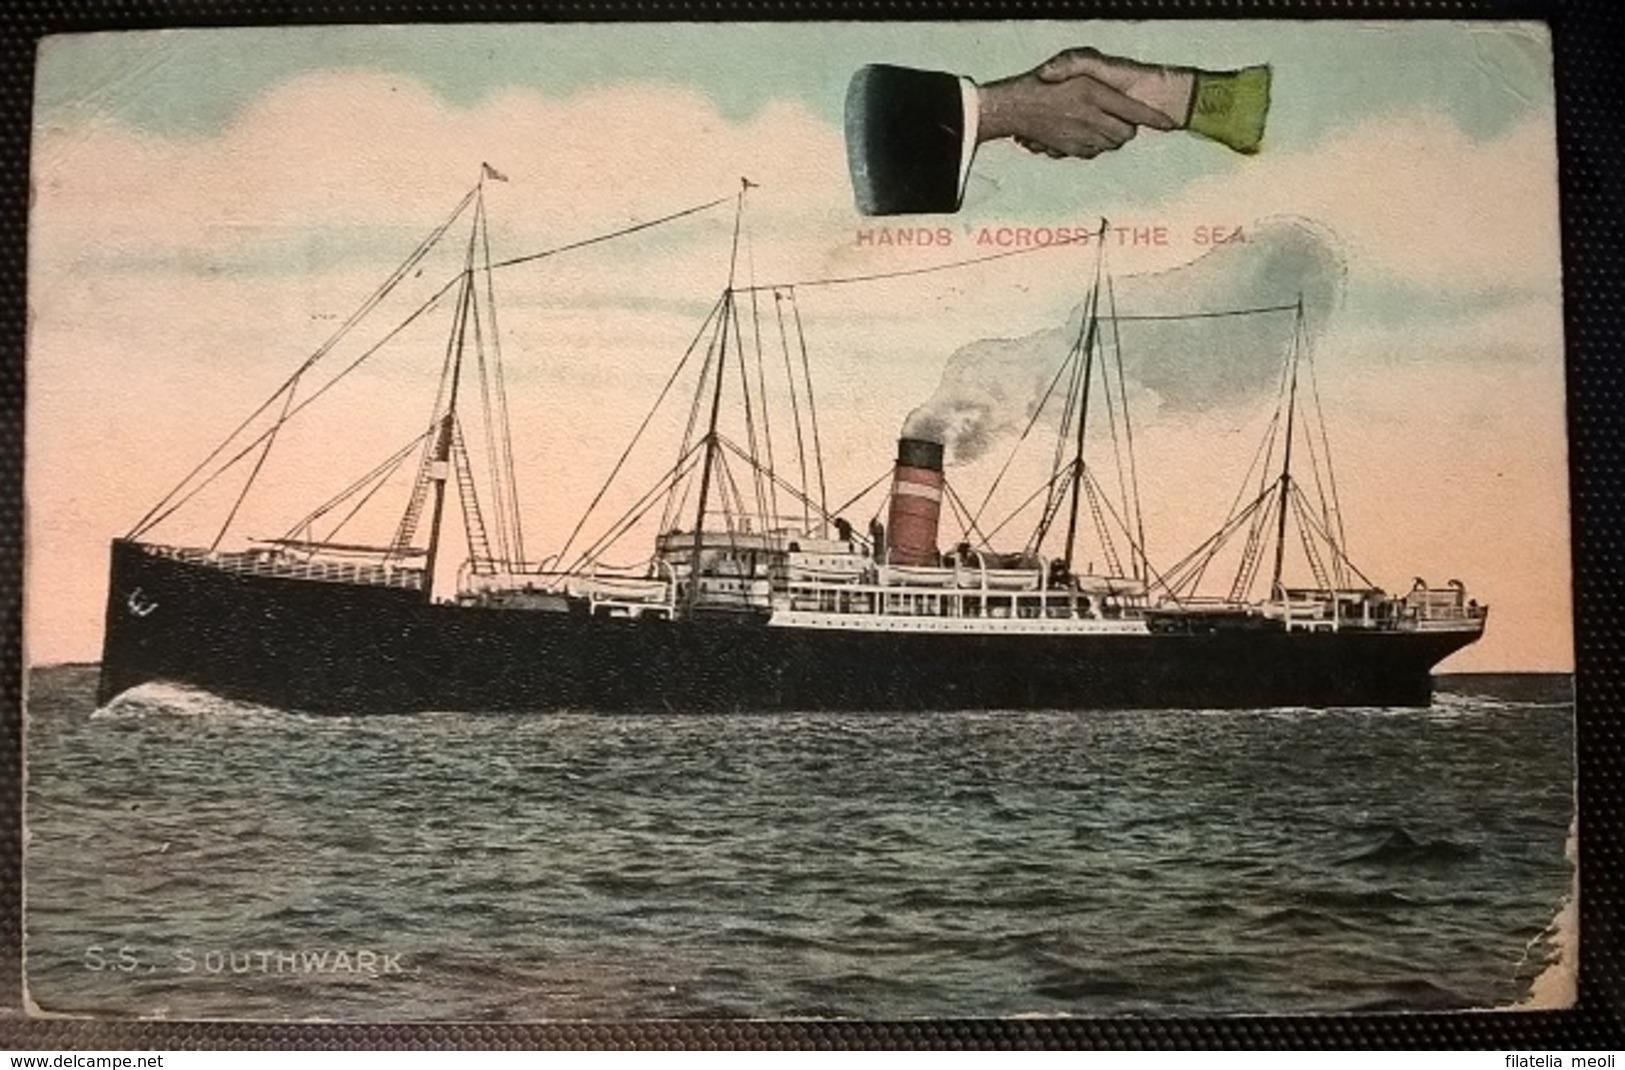 TRANSATLANTICI - S.S. SOUTHWARK - Barche